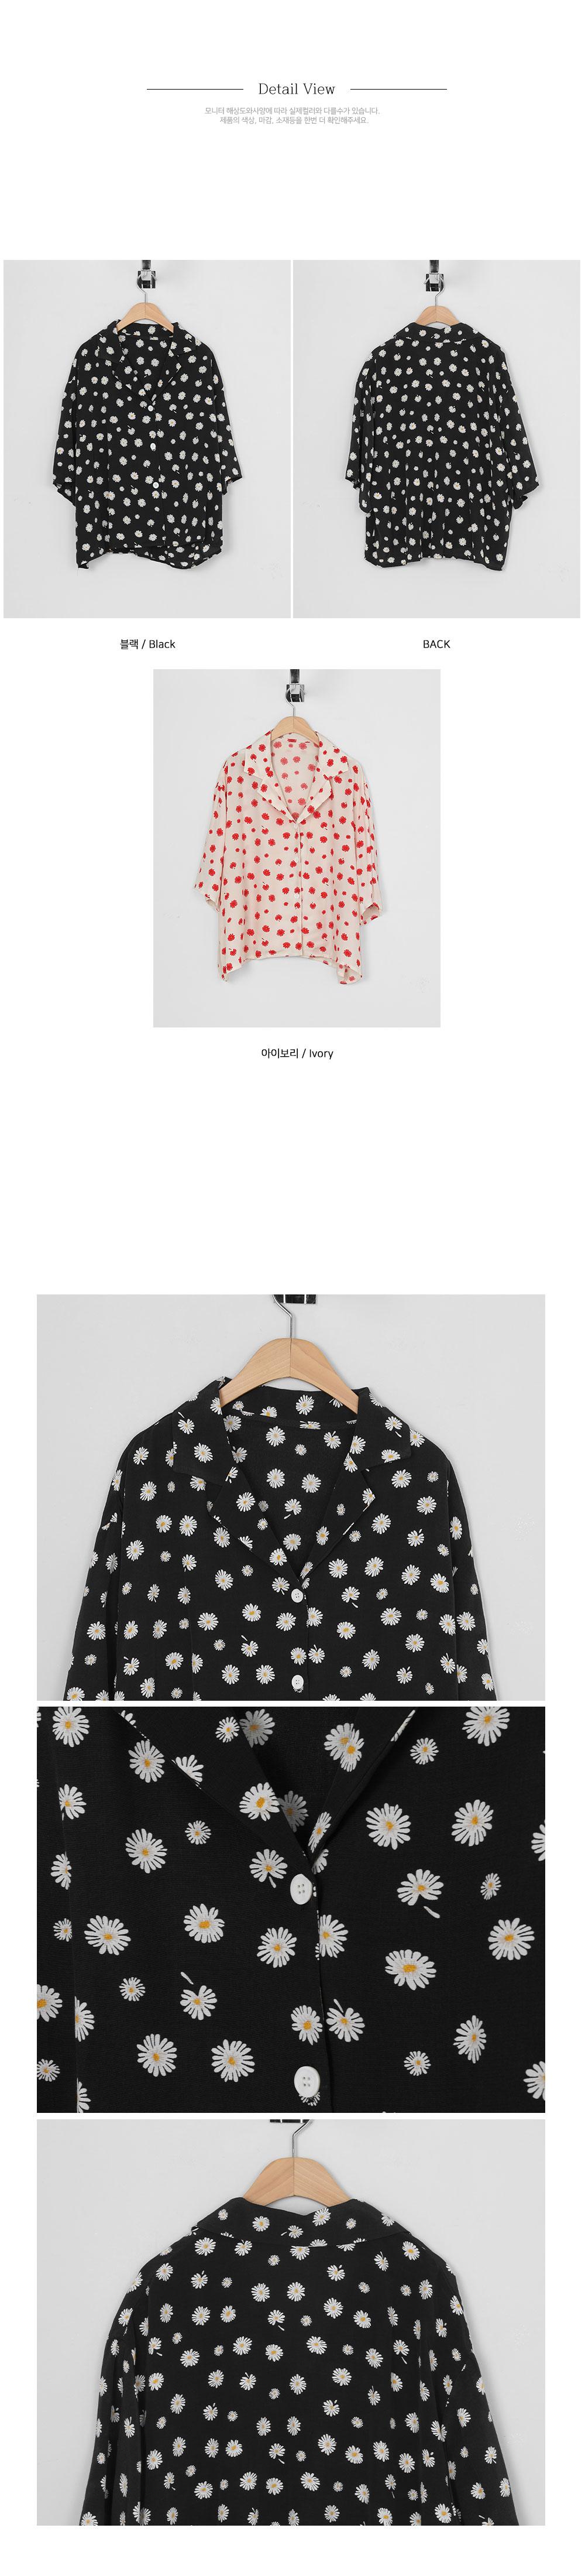 Daisy Loose-fit Collar Shirt